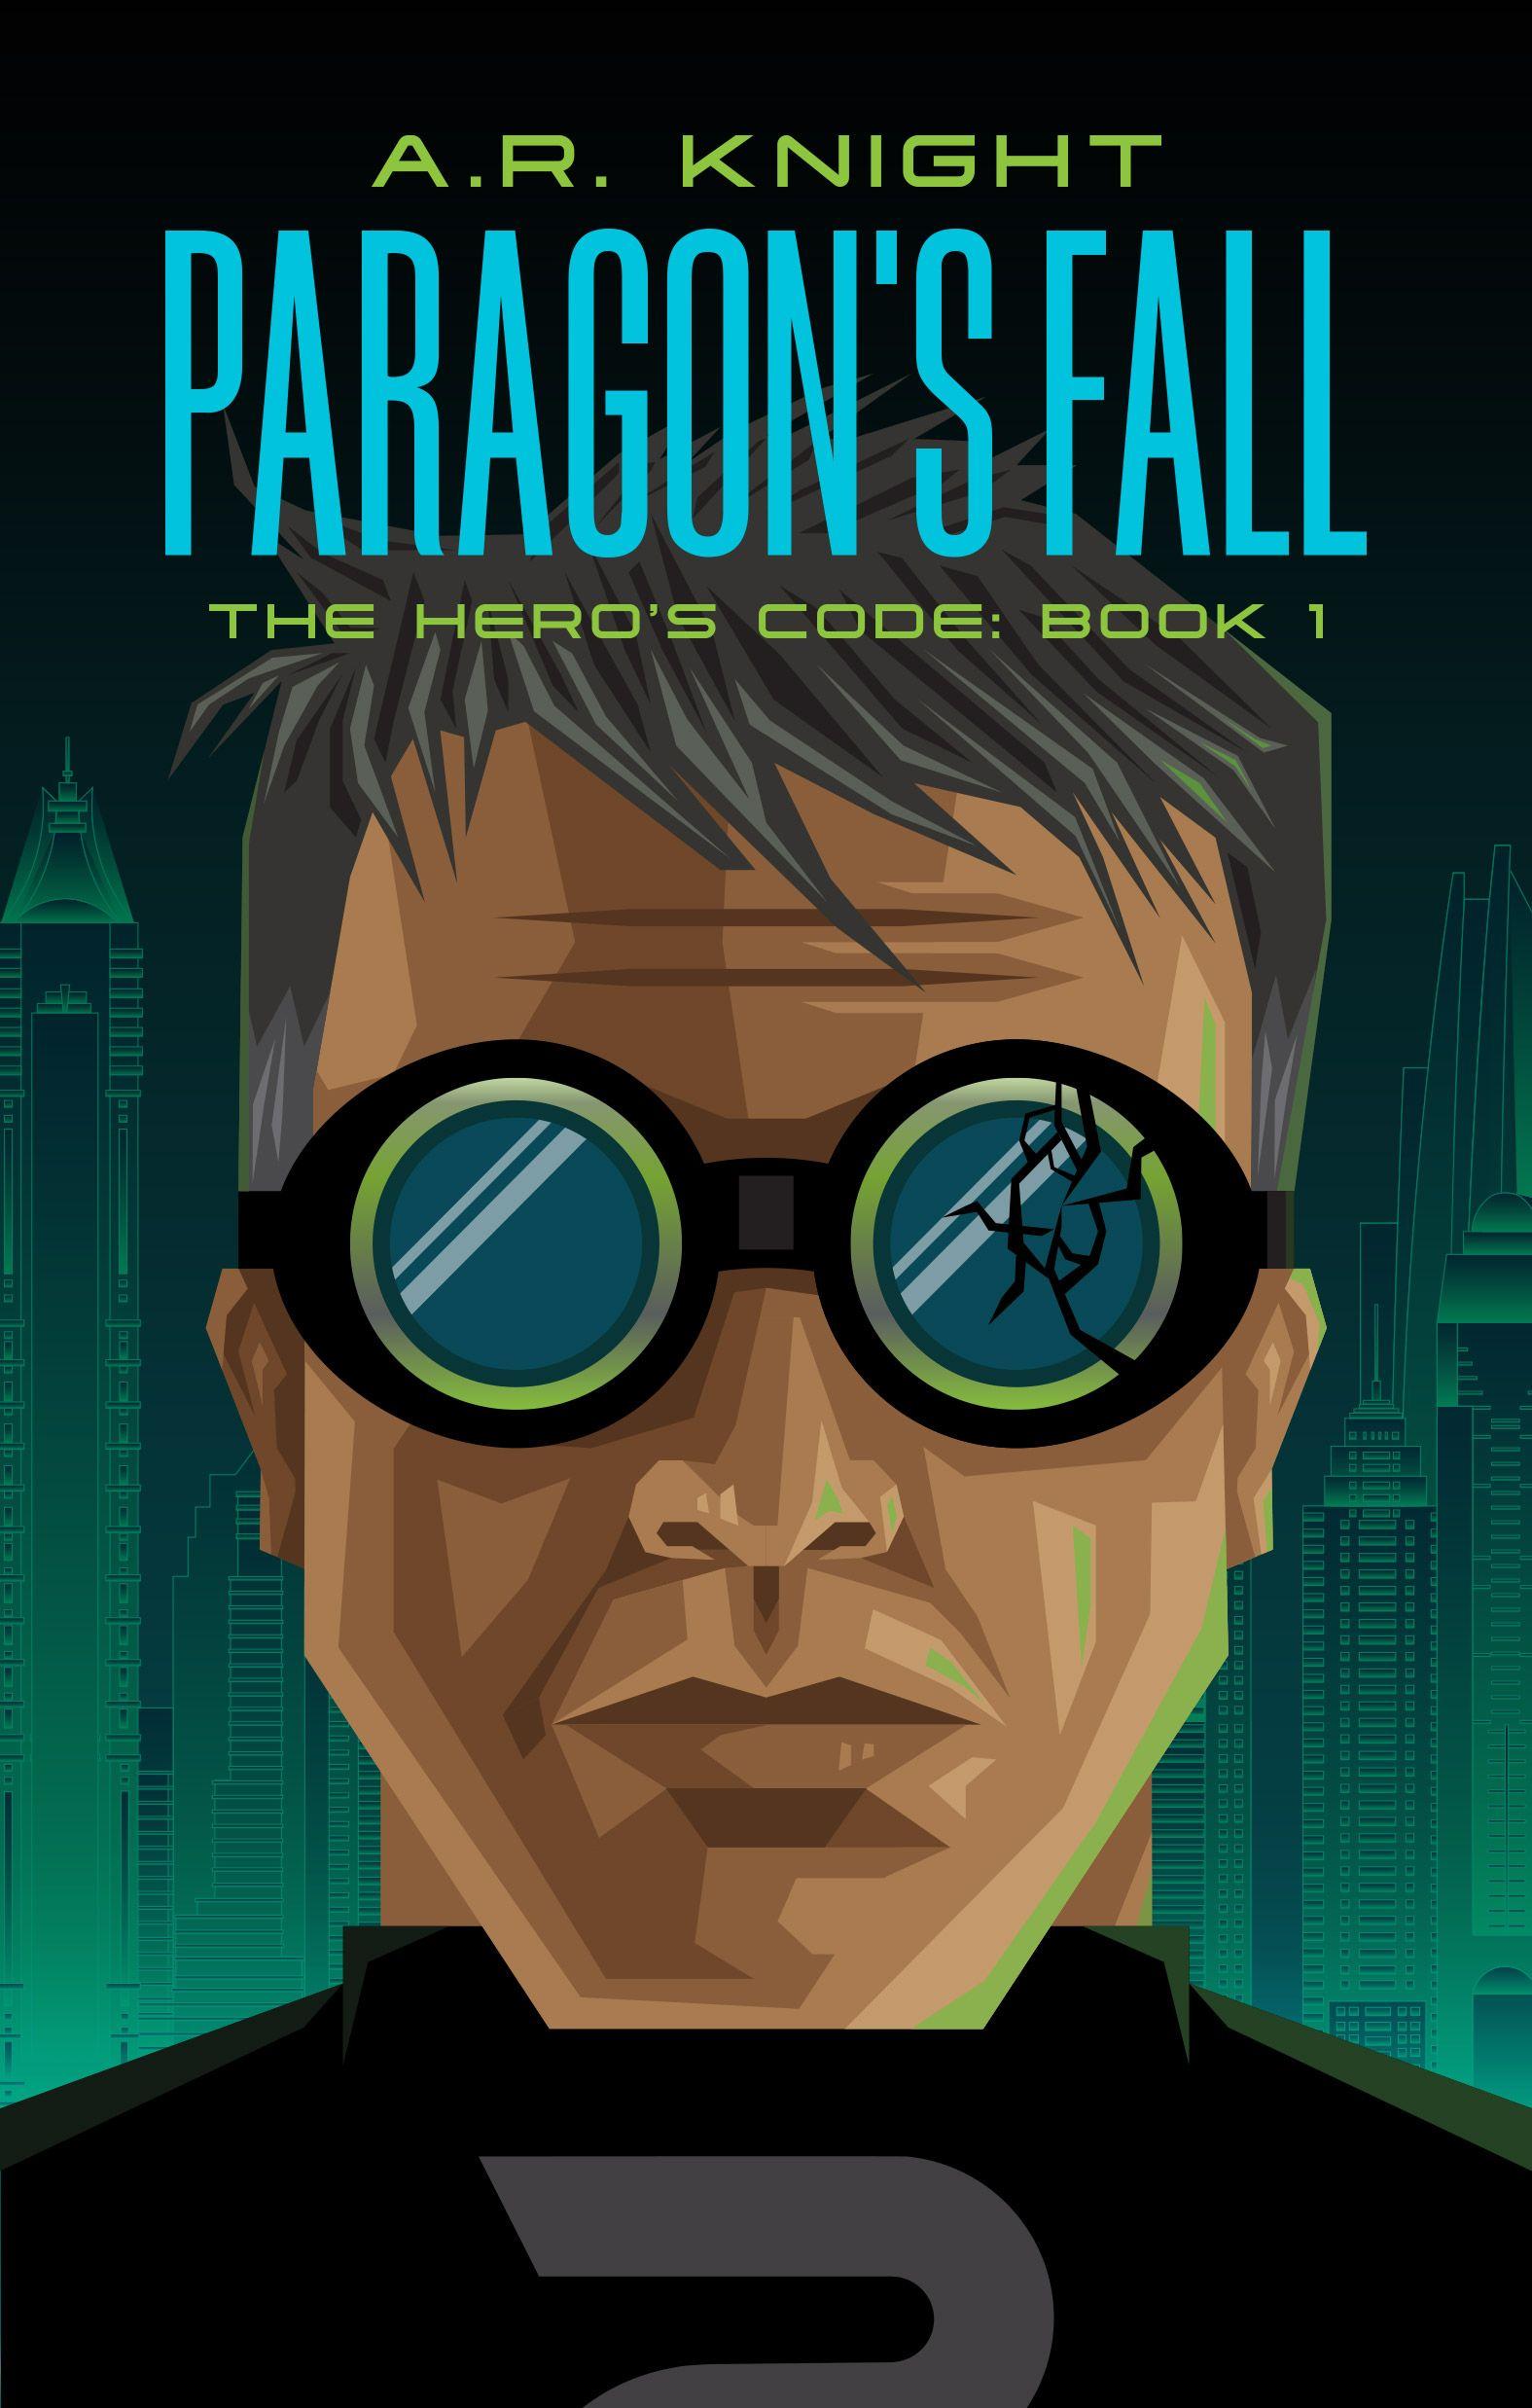 Paragon's Fall